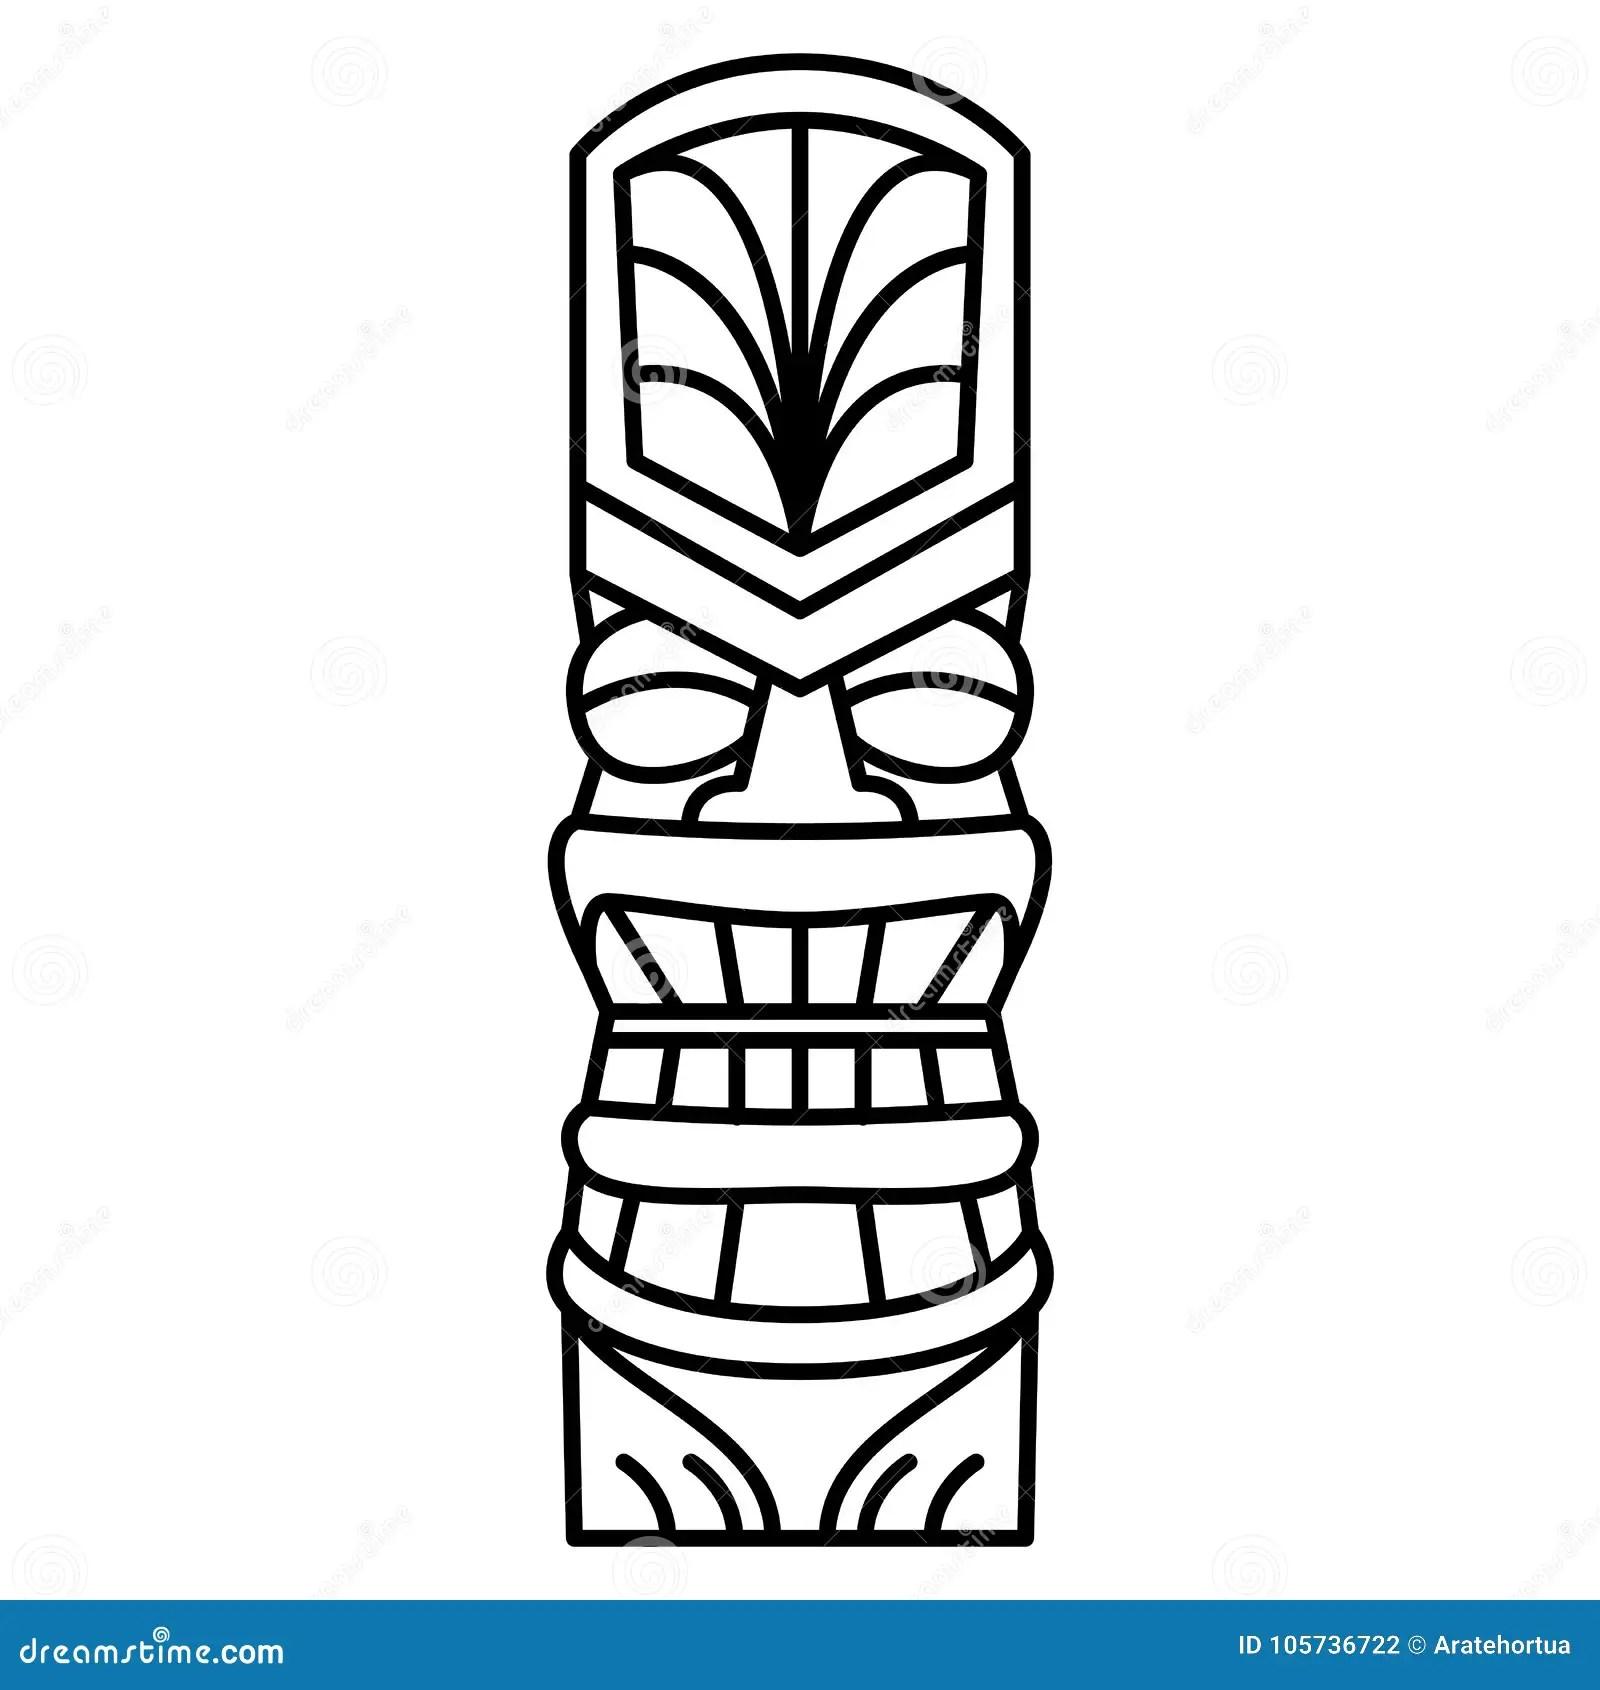 Cartoon Tiki Idol Isolated On White Background Stock